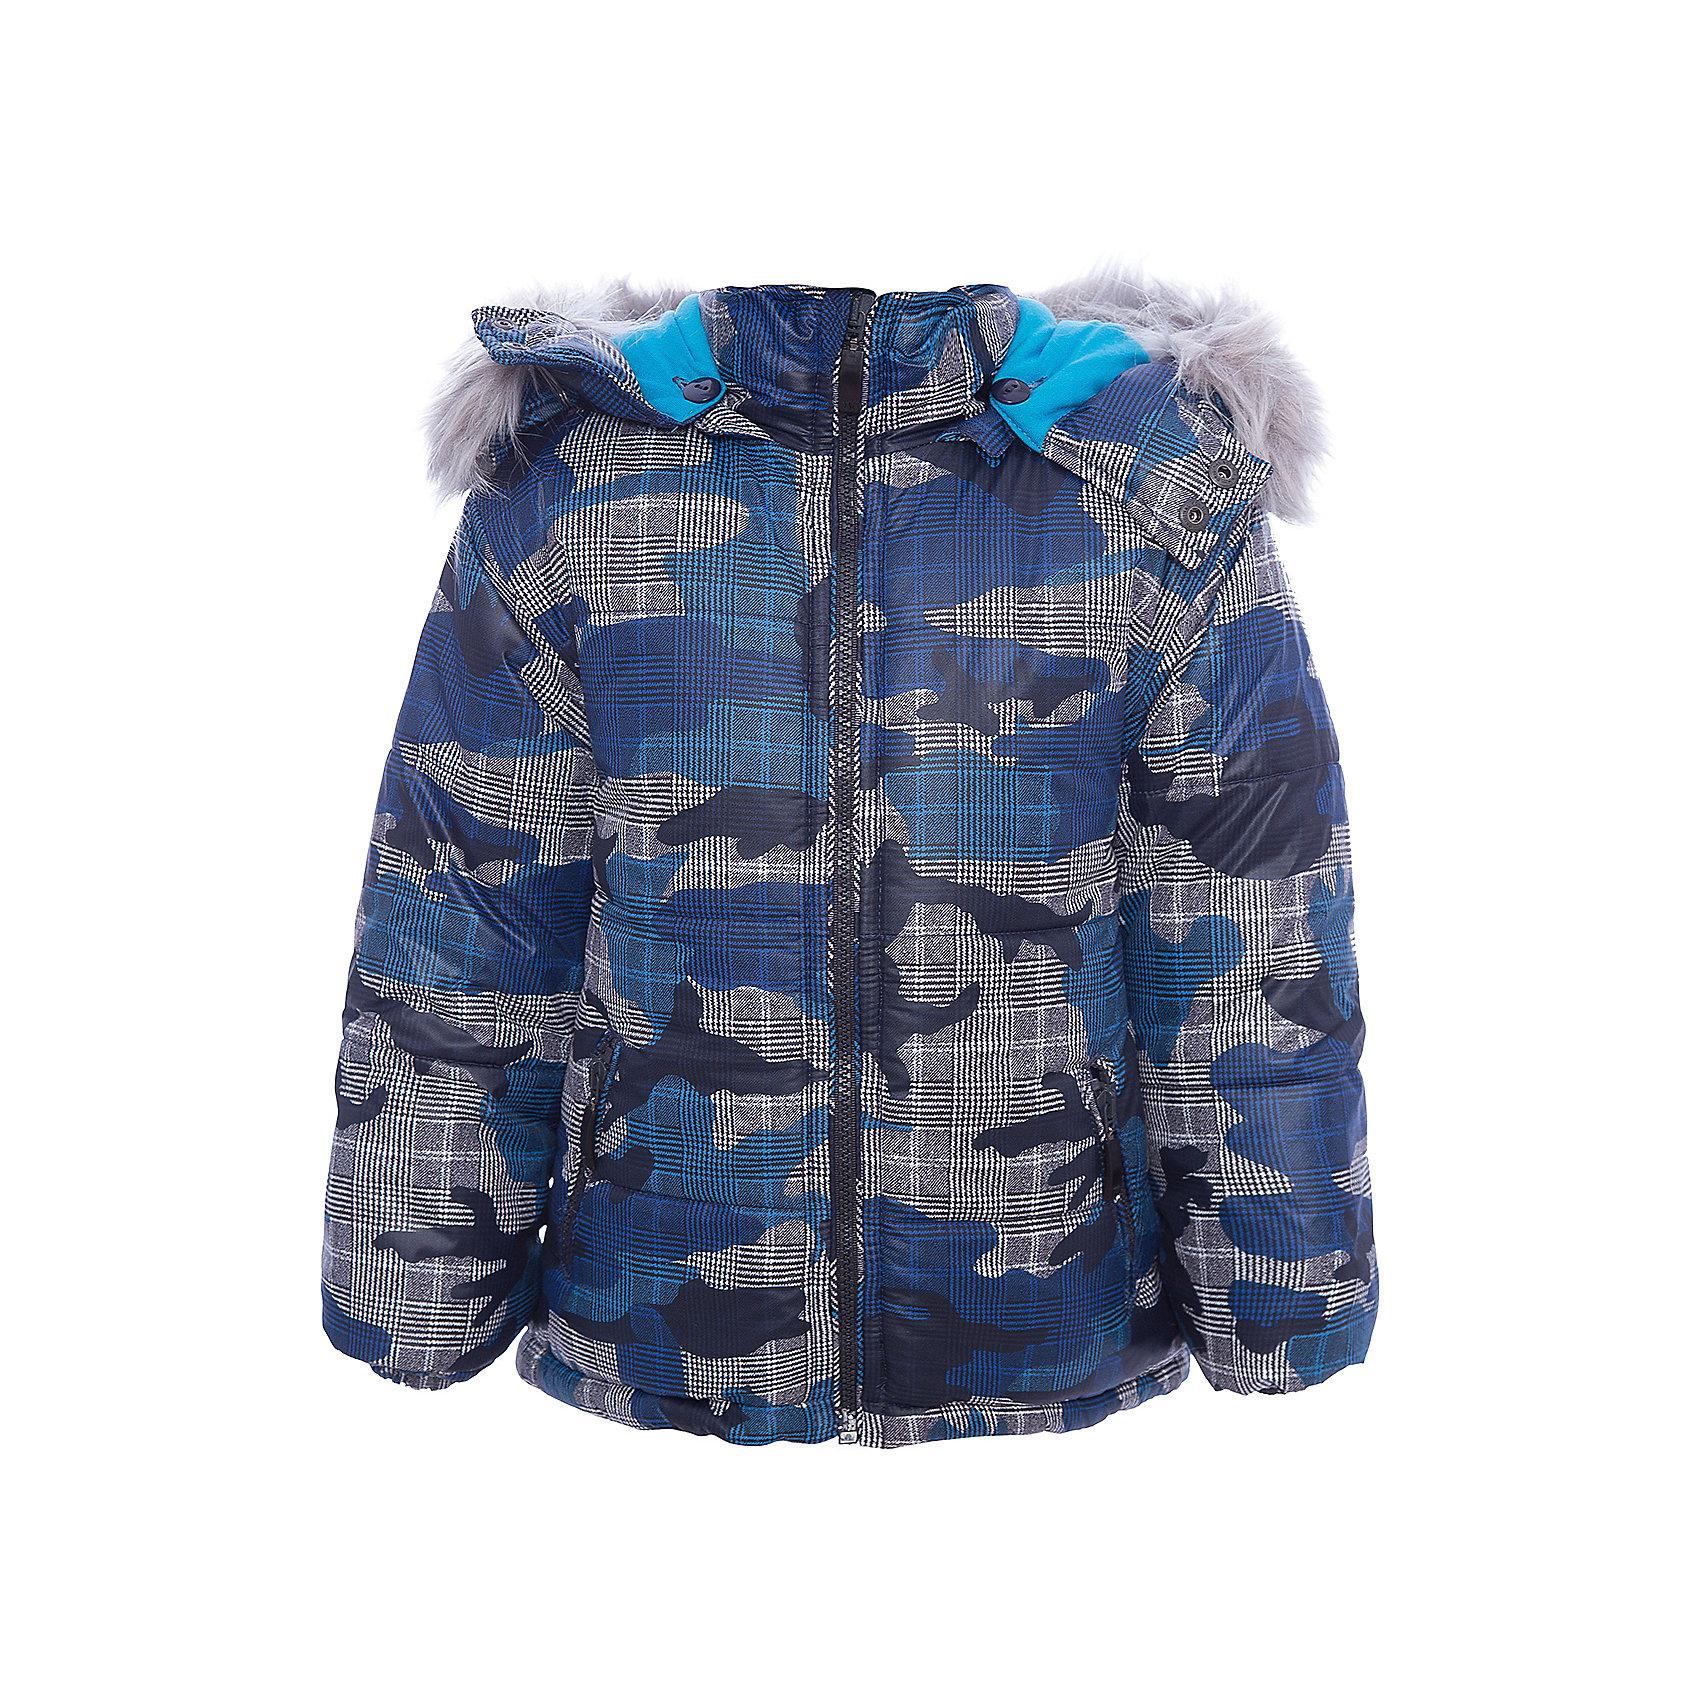 Куртка утепленная для мальчика WojcikВерхняя одежда<br>Куртка утепленная для мальчика Wojcik<br>Состав:<br>Полиэстер 100%<br><br>Ширина мм: 356<br>Глубина мм: 10<br>Высота мм: 245<br>Вес г: 519<br>Цвет: белый<br>Возраст от месяцев: 84<br>Возраст до месяцев: 96<br>Пол: Мужской<br>Возраст: Детский<br>Размер: 128,92,98,104,110,116,122<br>SKU: 5592127